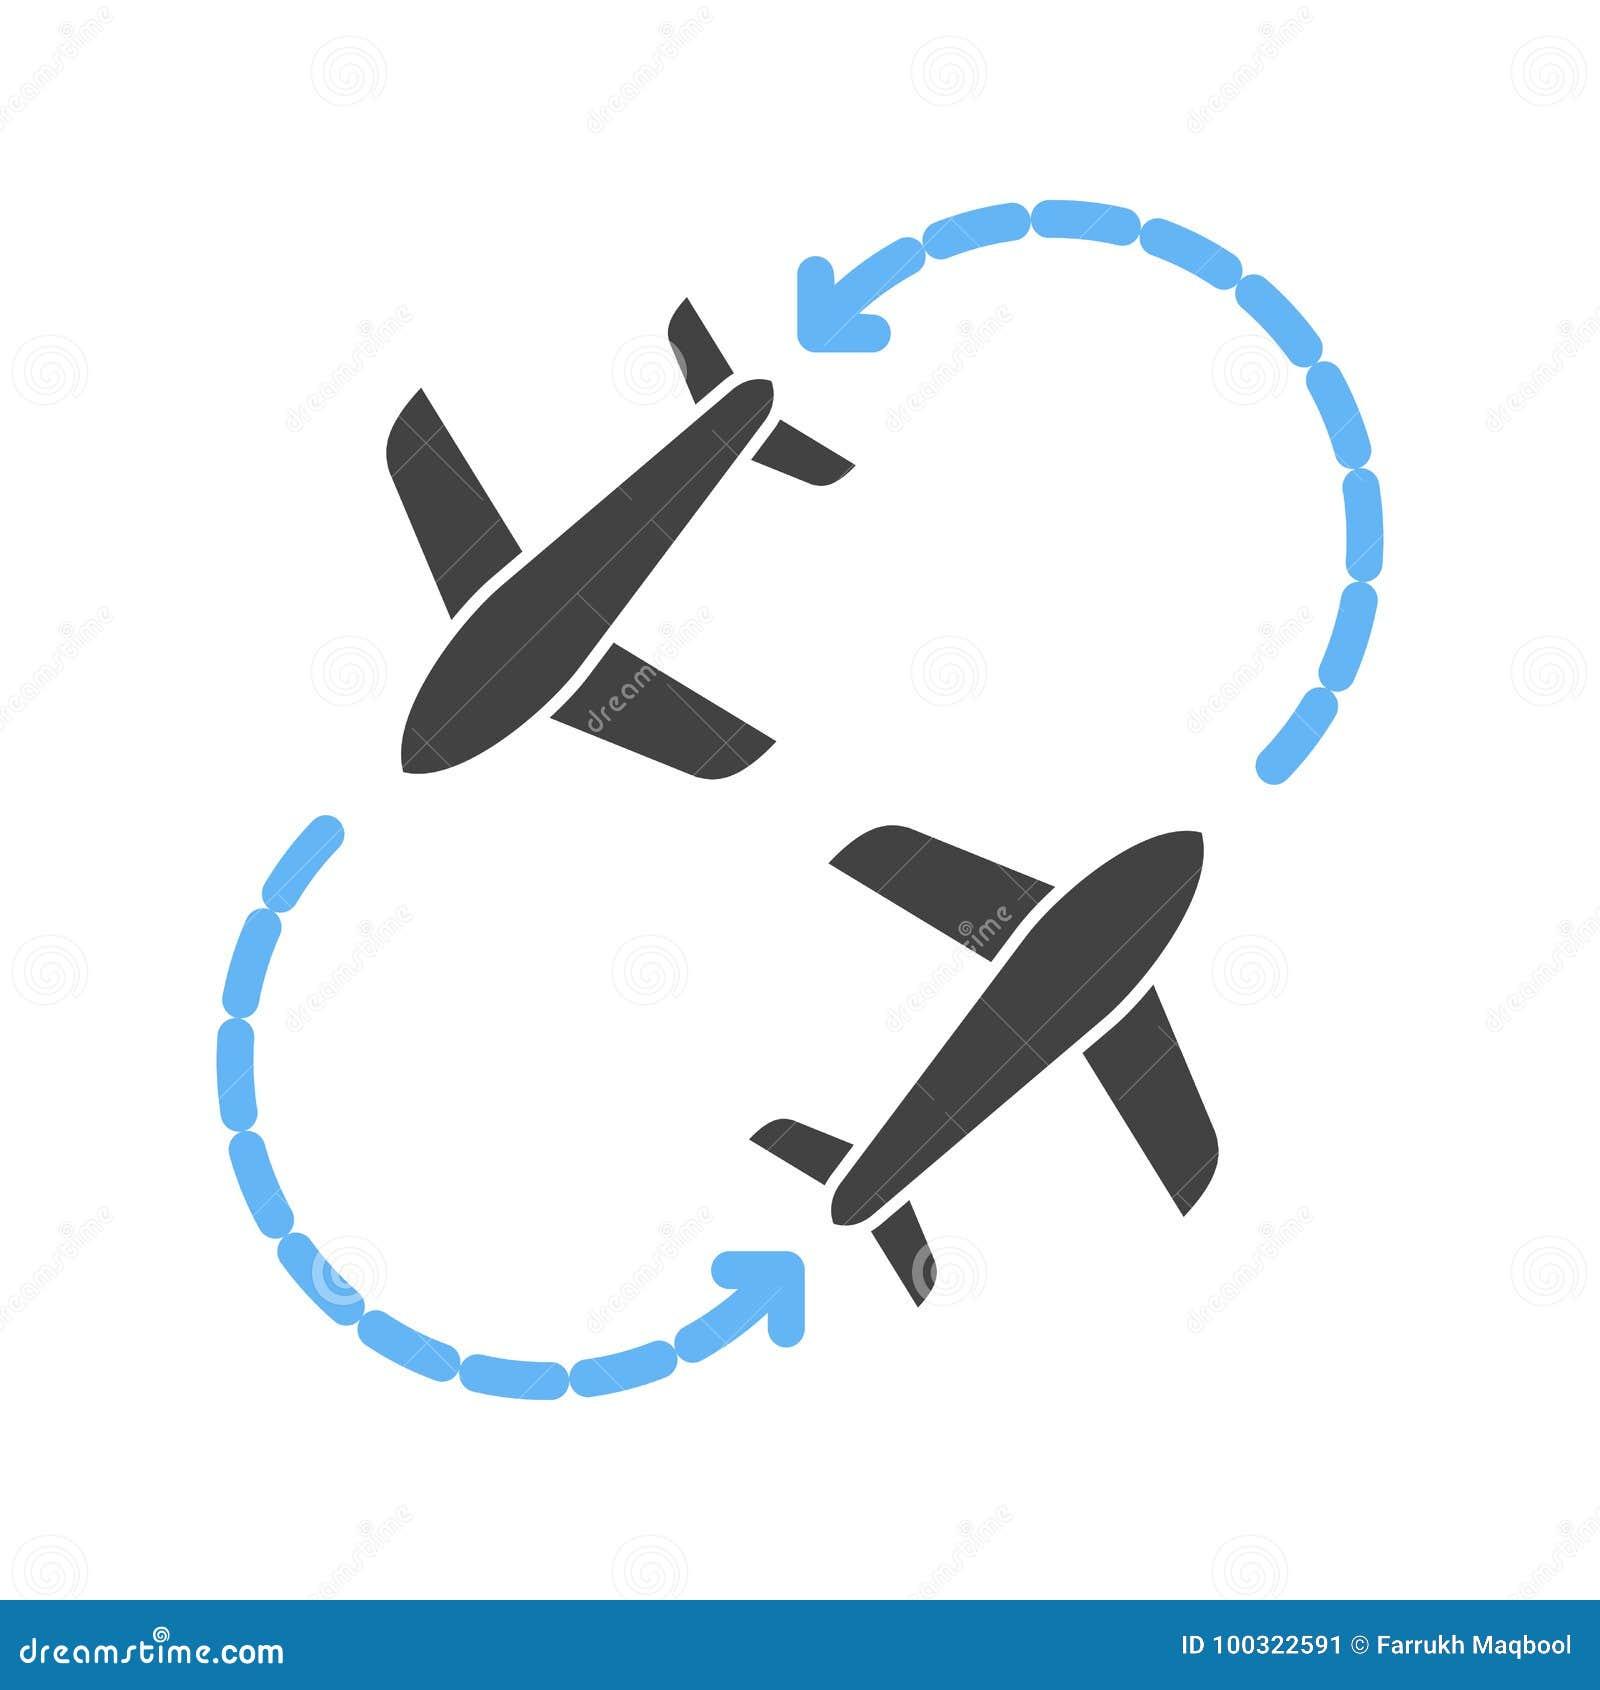 Download Round Travel Flights Stock Vector Illustration Of Design